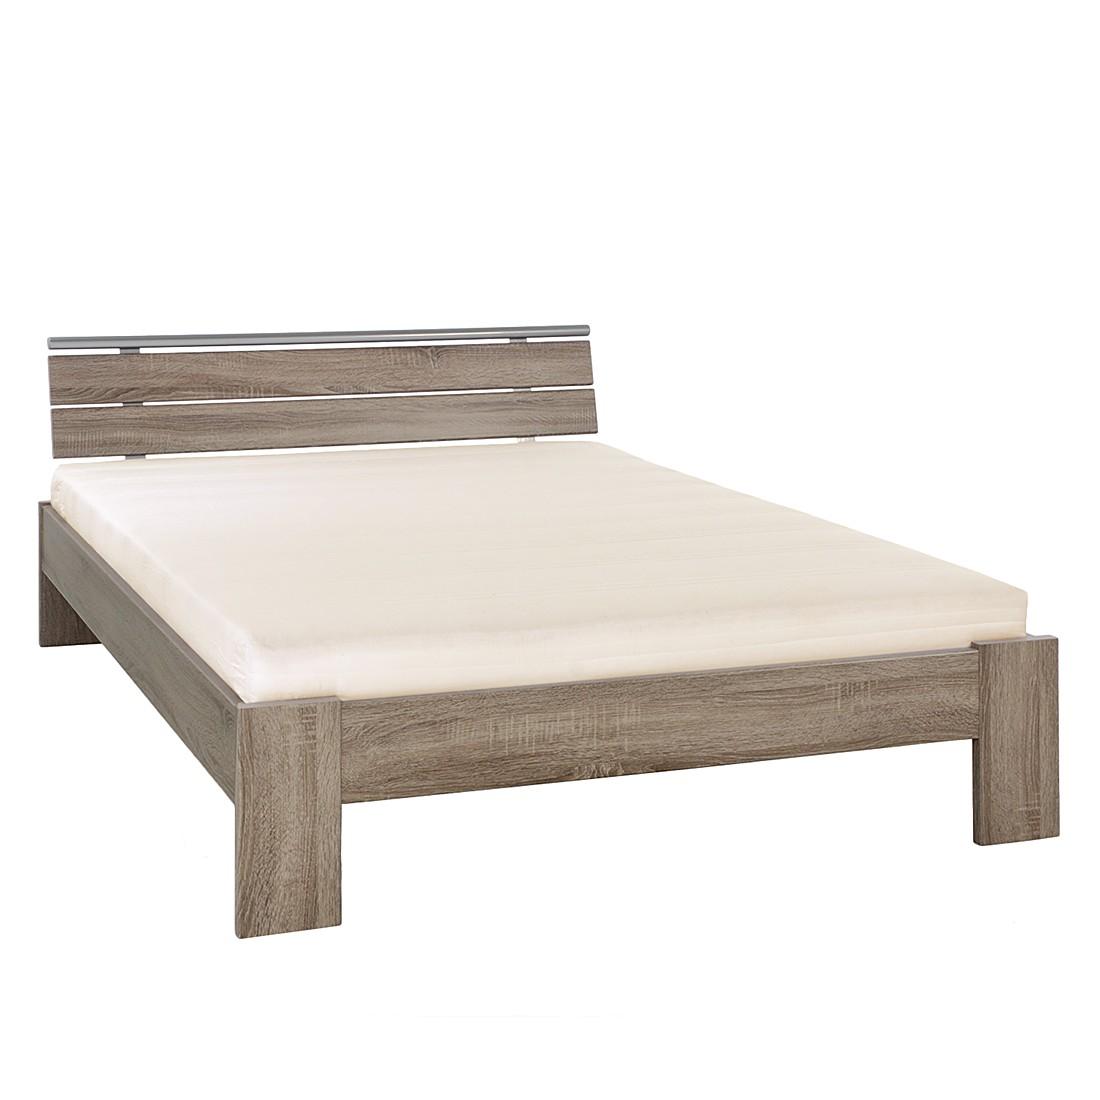 bett megan 140 x 200cm bettgestell mit matratze lattenrost tr ffeleiche dekor home. Black Bedroom Furniture Sets. Home Design Ideas